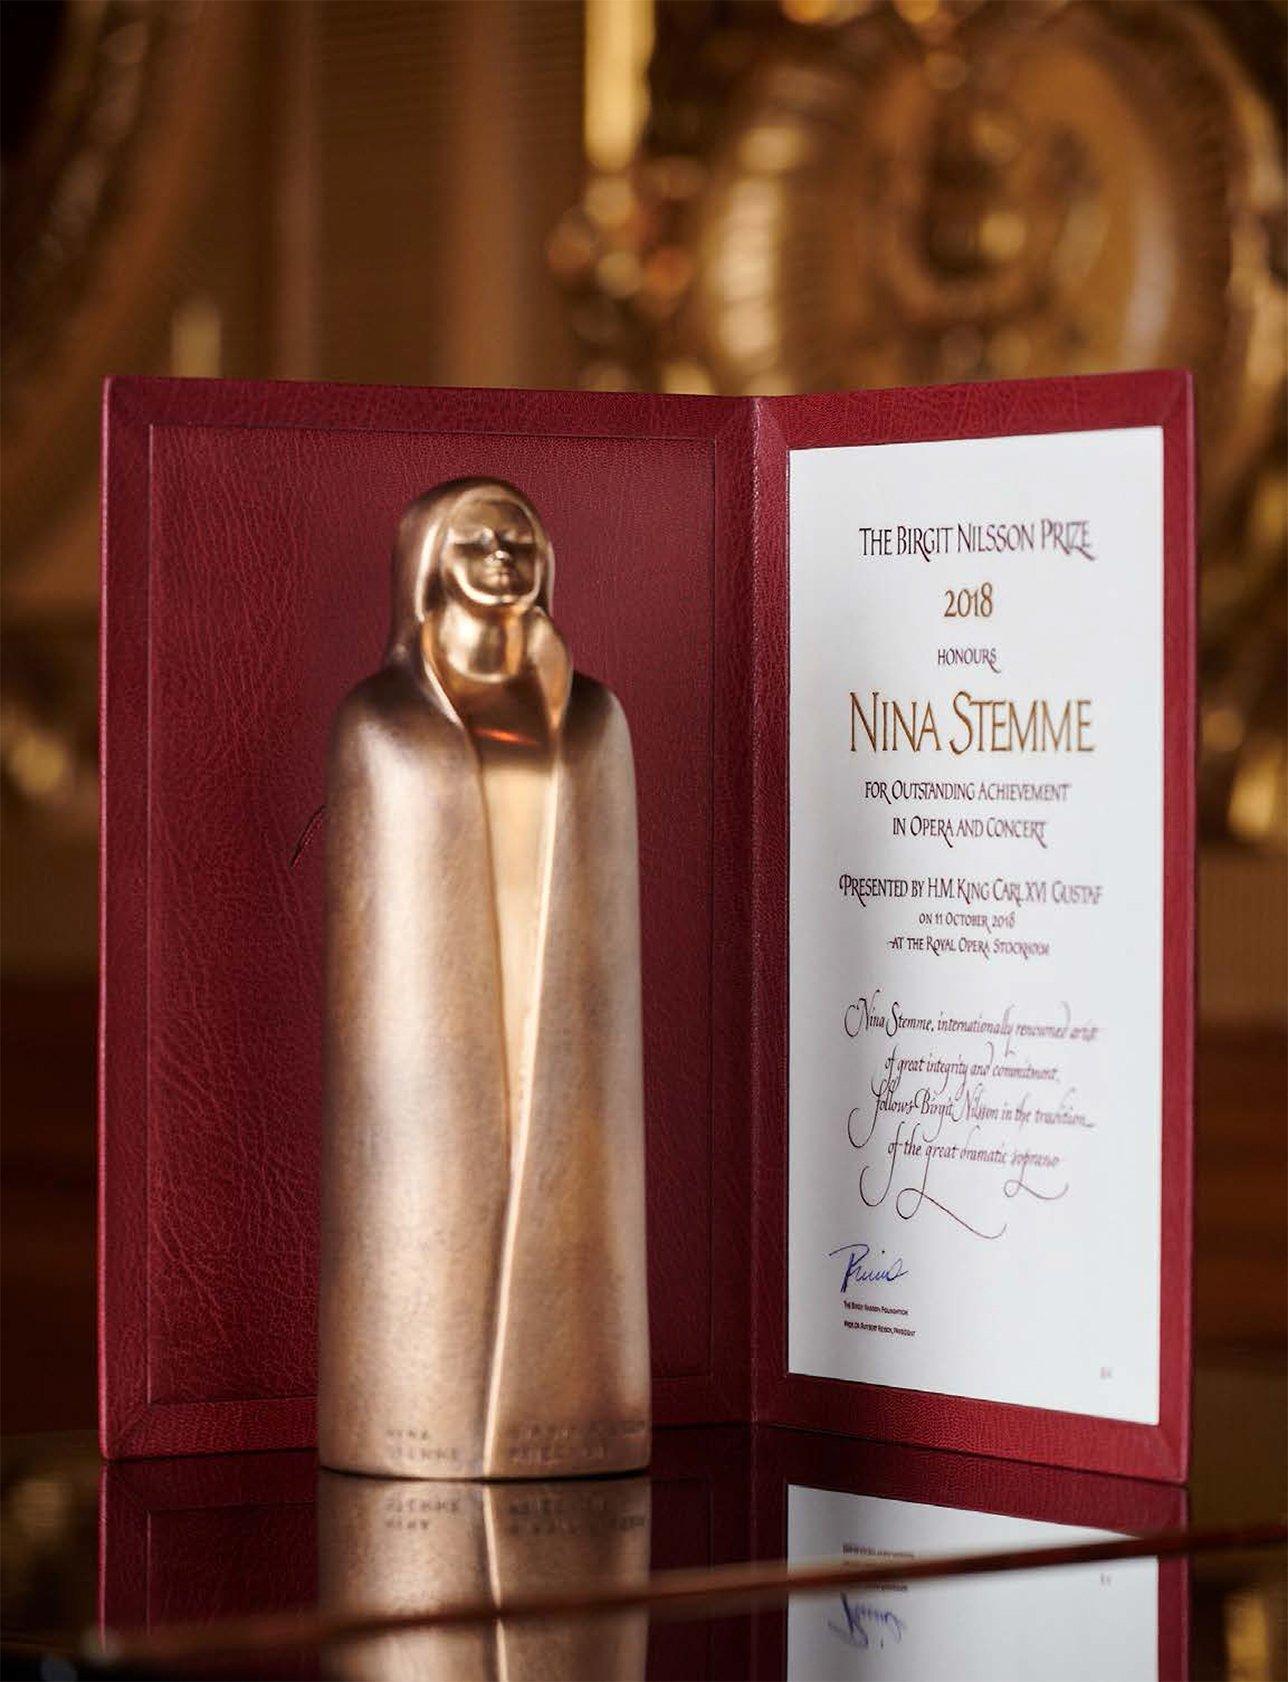 Birgit Nilsson Prize, vince Nina Stemme